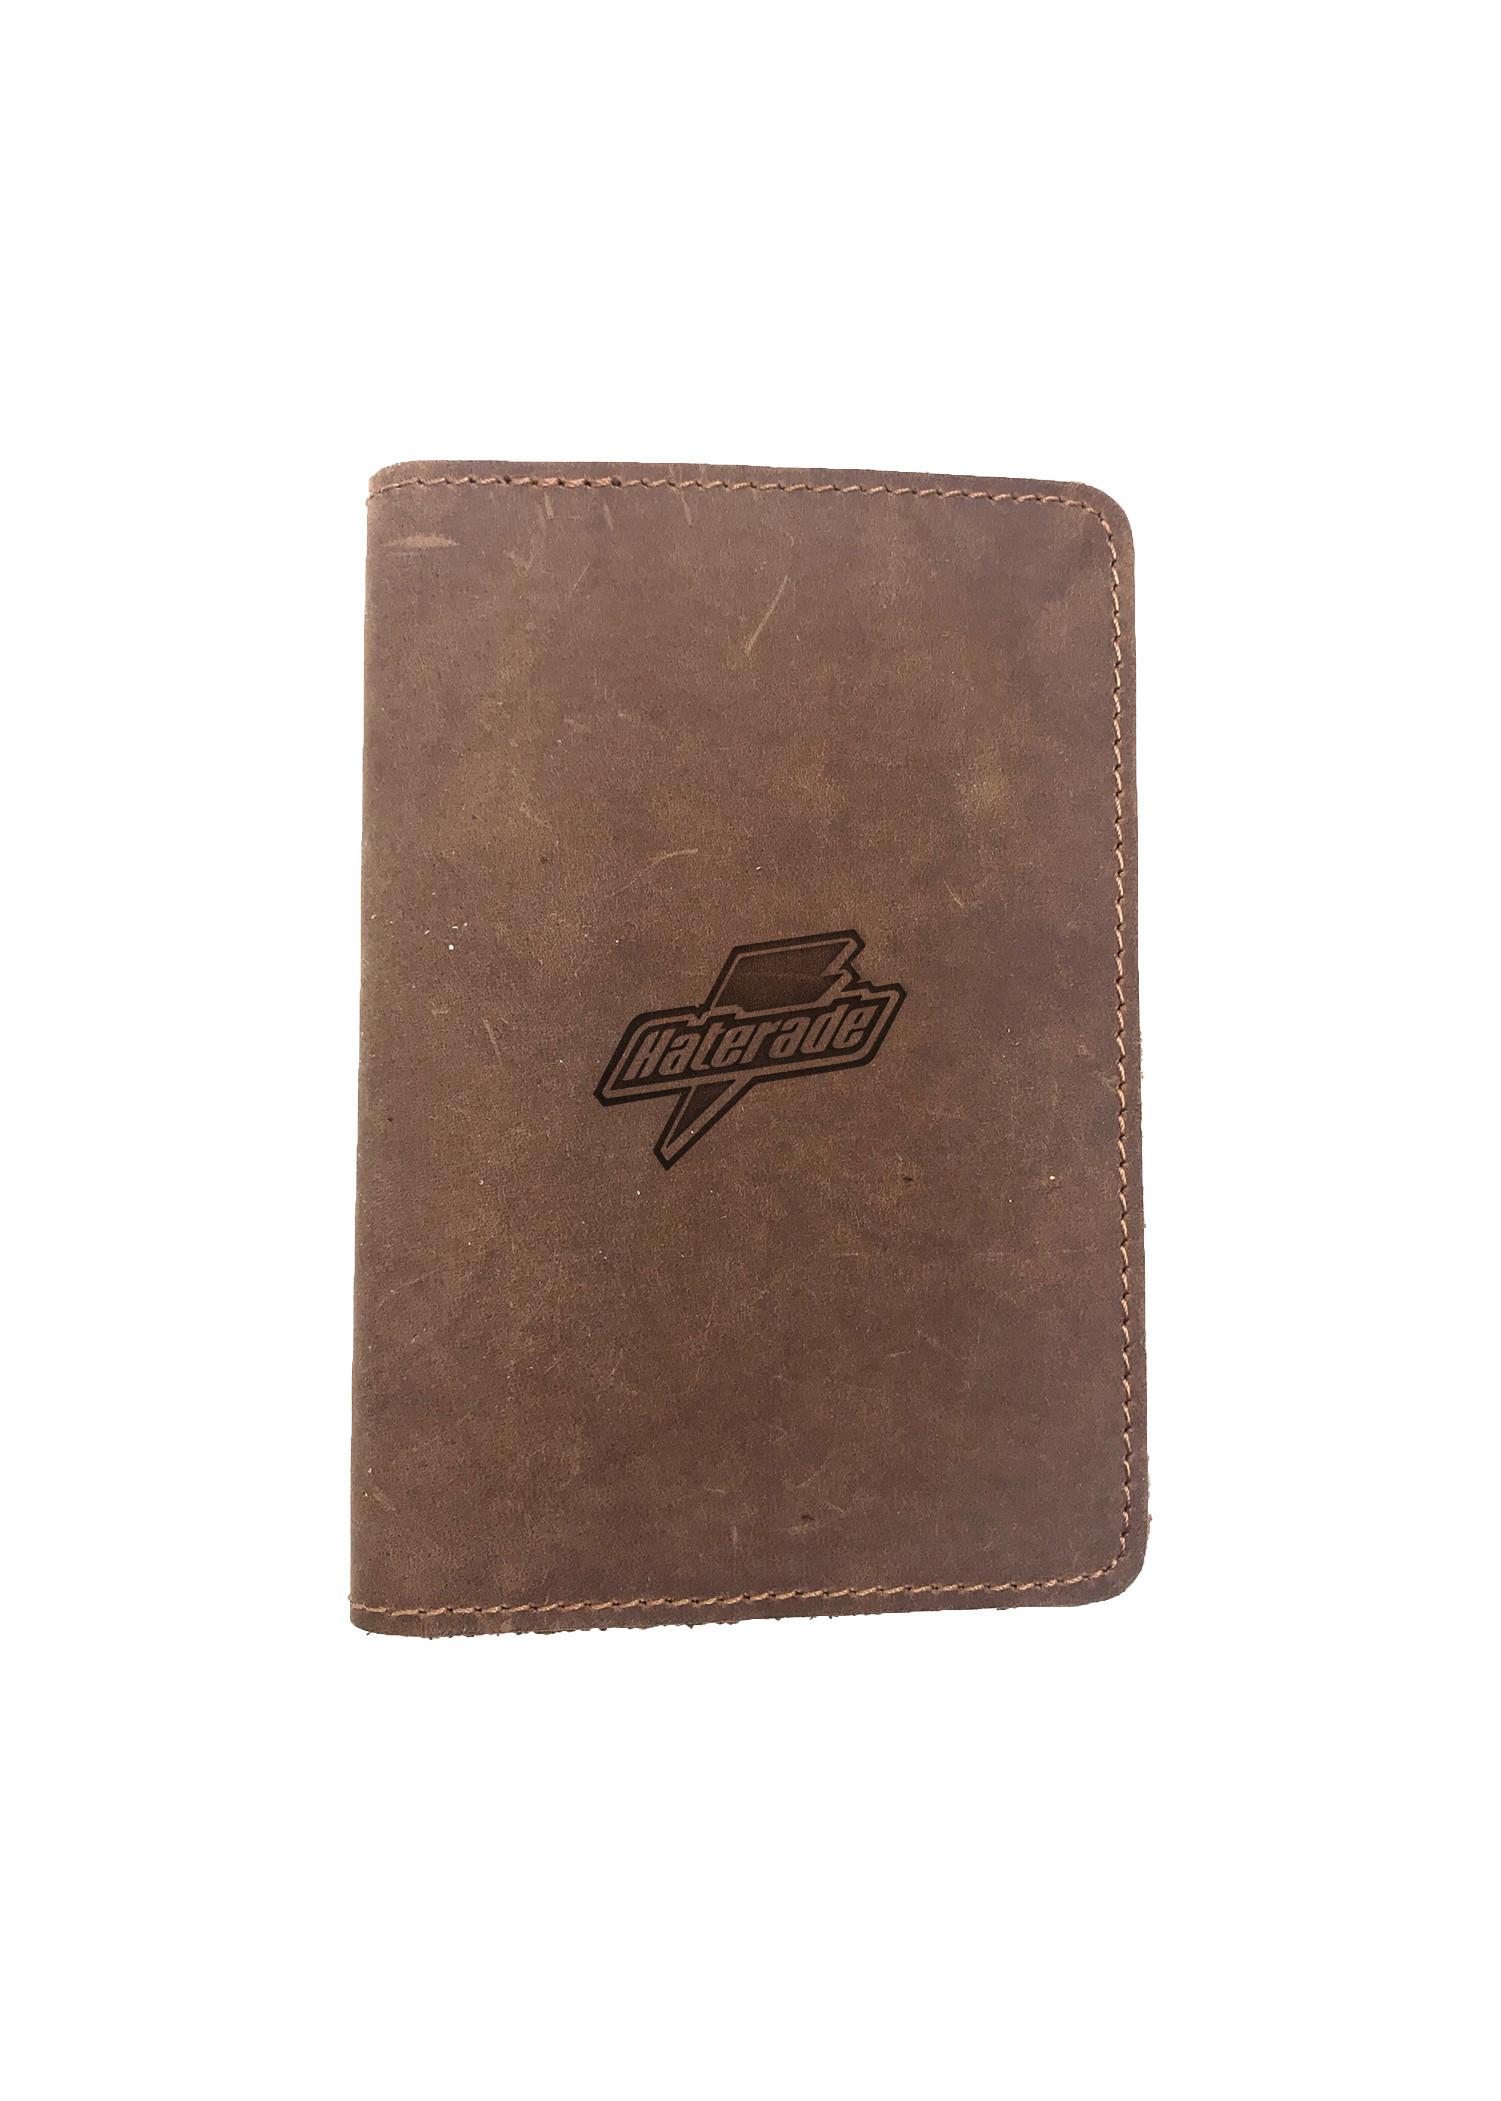 Passport Cover Bao Da Hộ Chiếu Da Sáp Khắc Hình Hình HATERADE (BROWN)